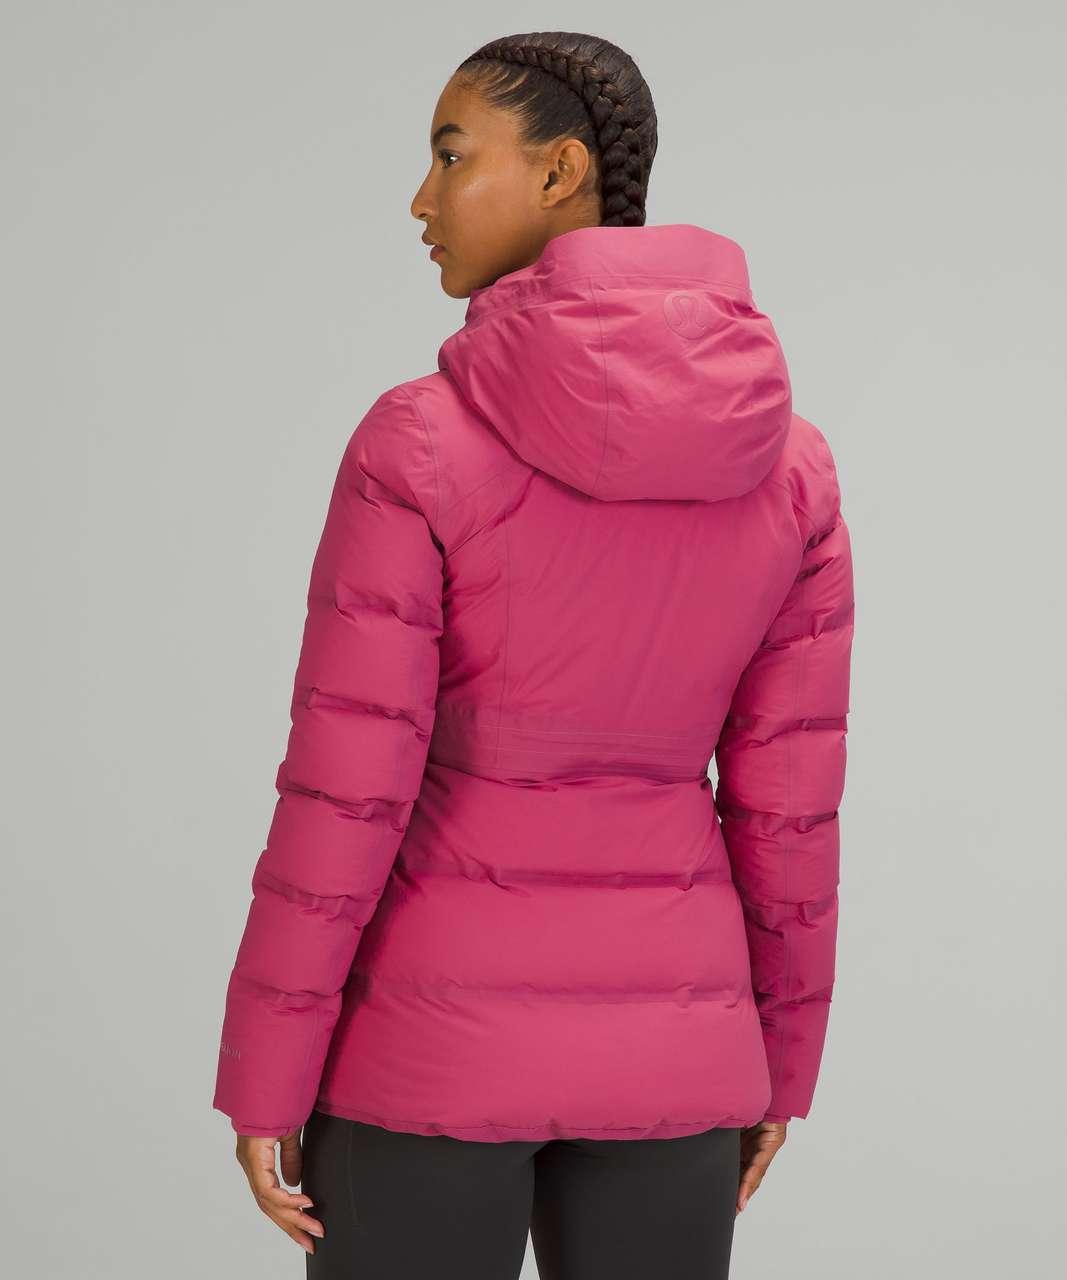 Lululemon Sleet Street Jacket - Pink Lychee